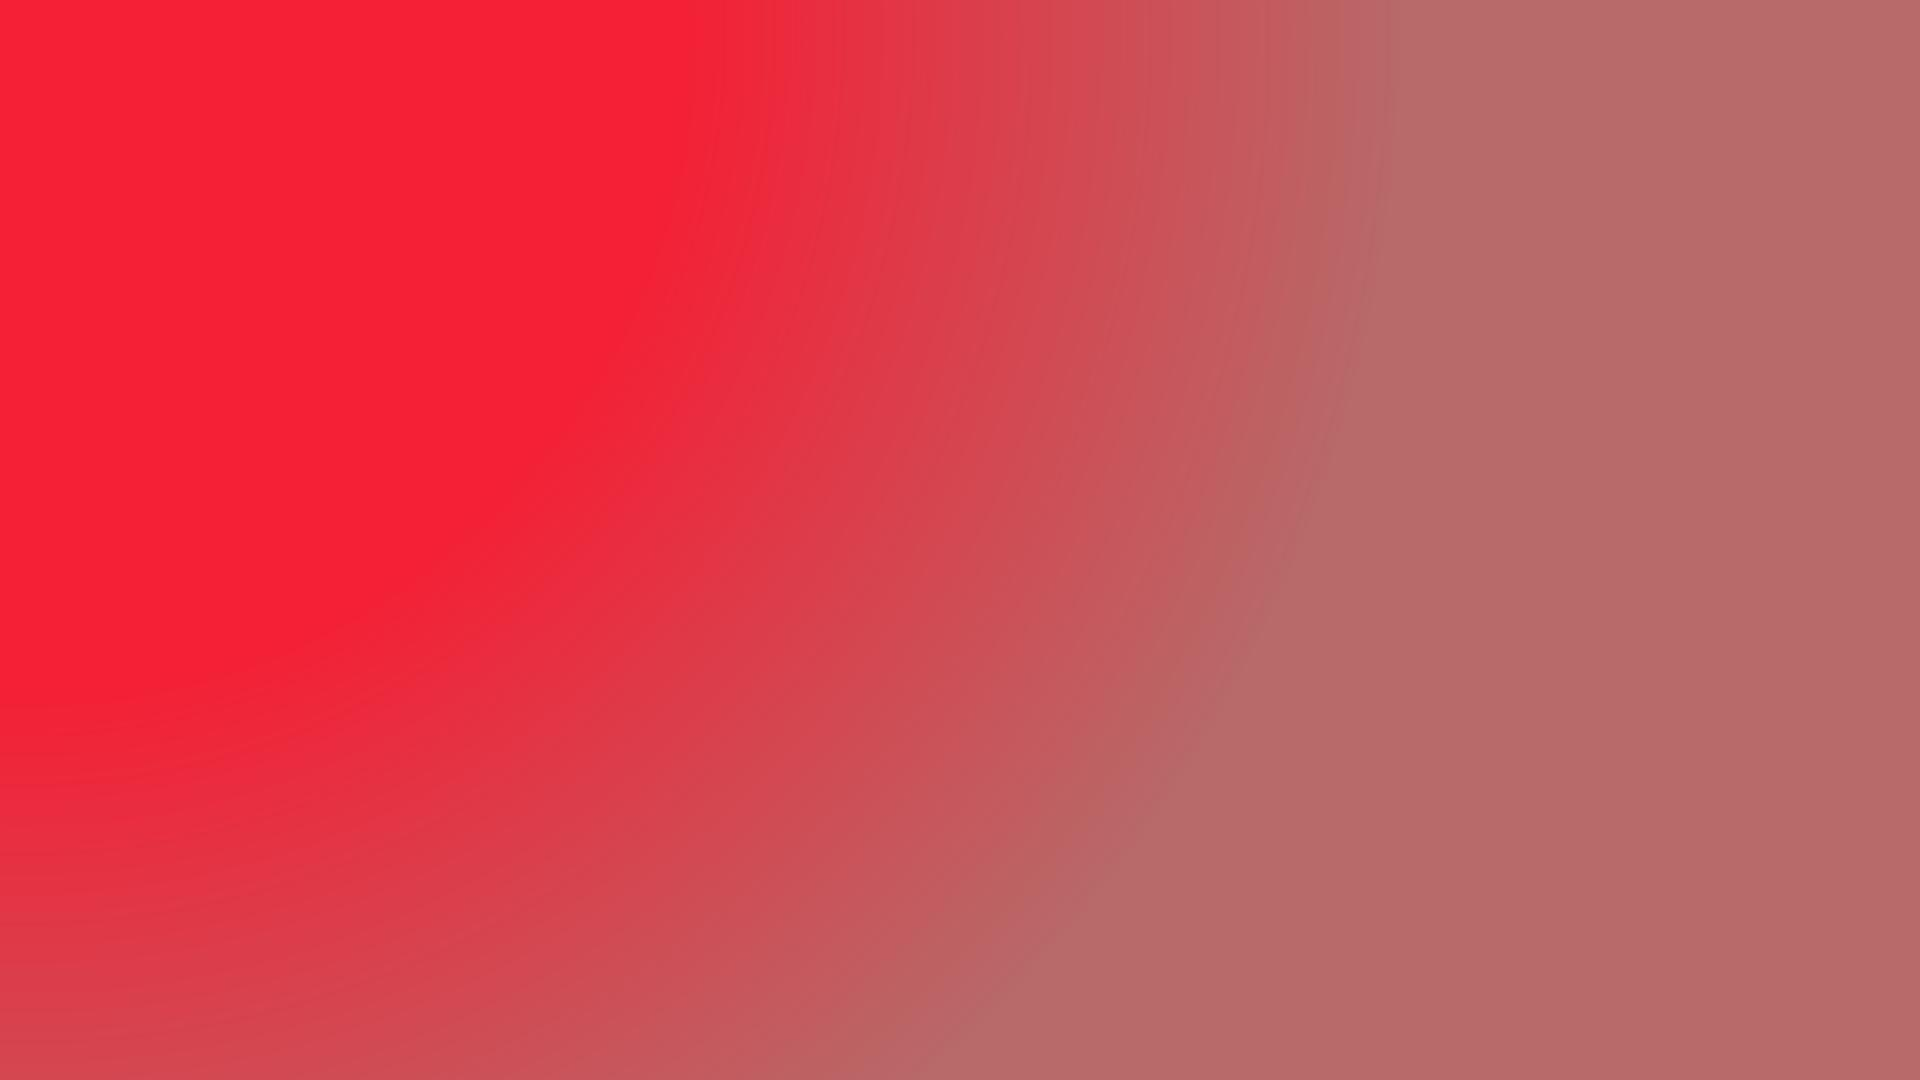 Vermelho Gradient